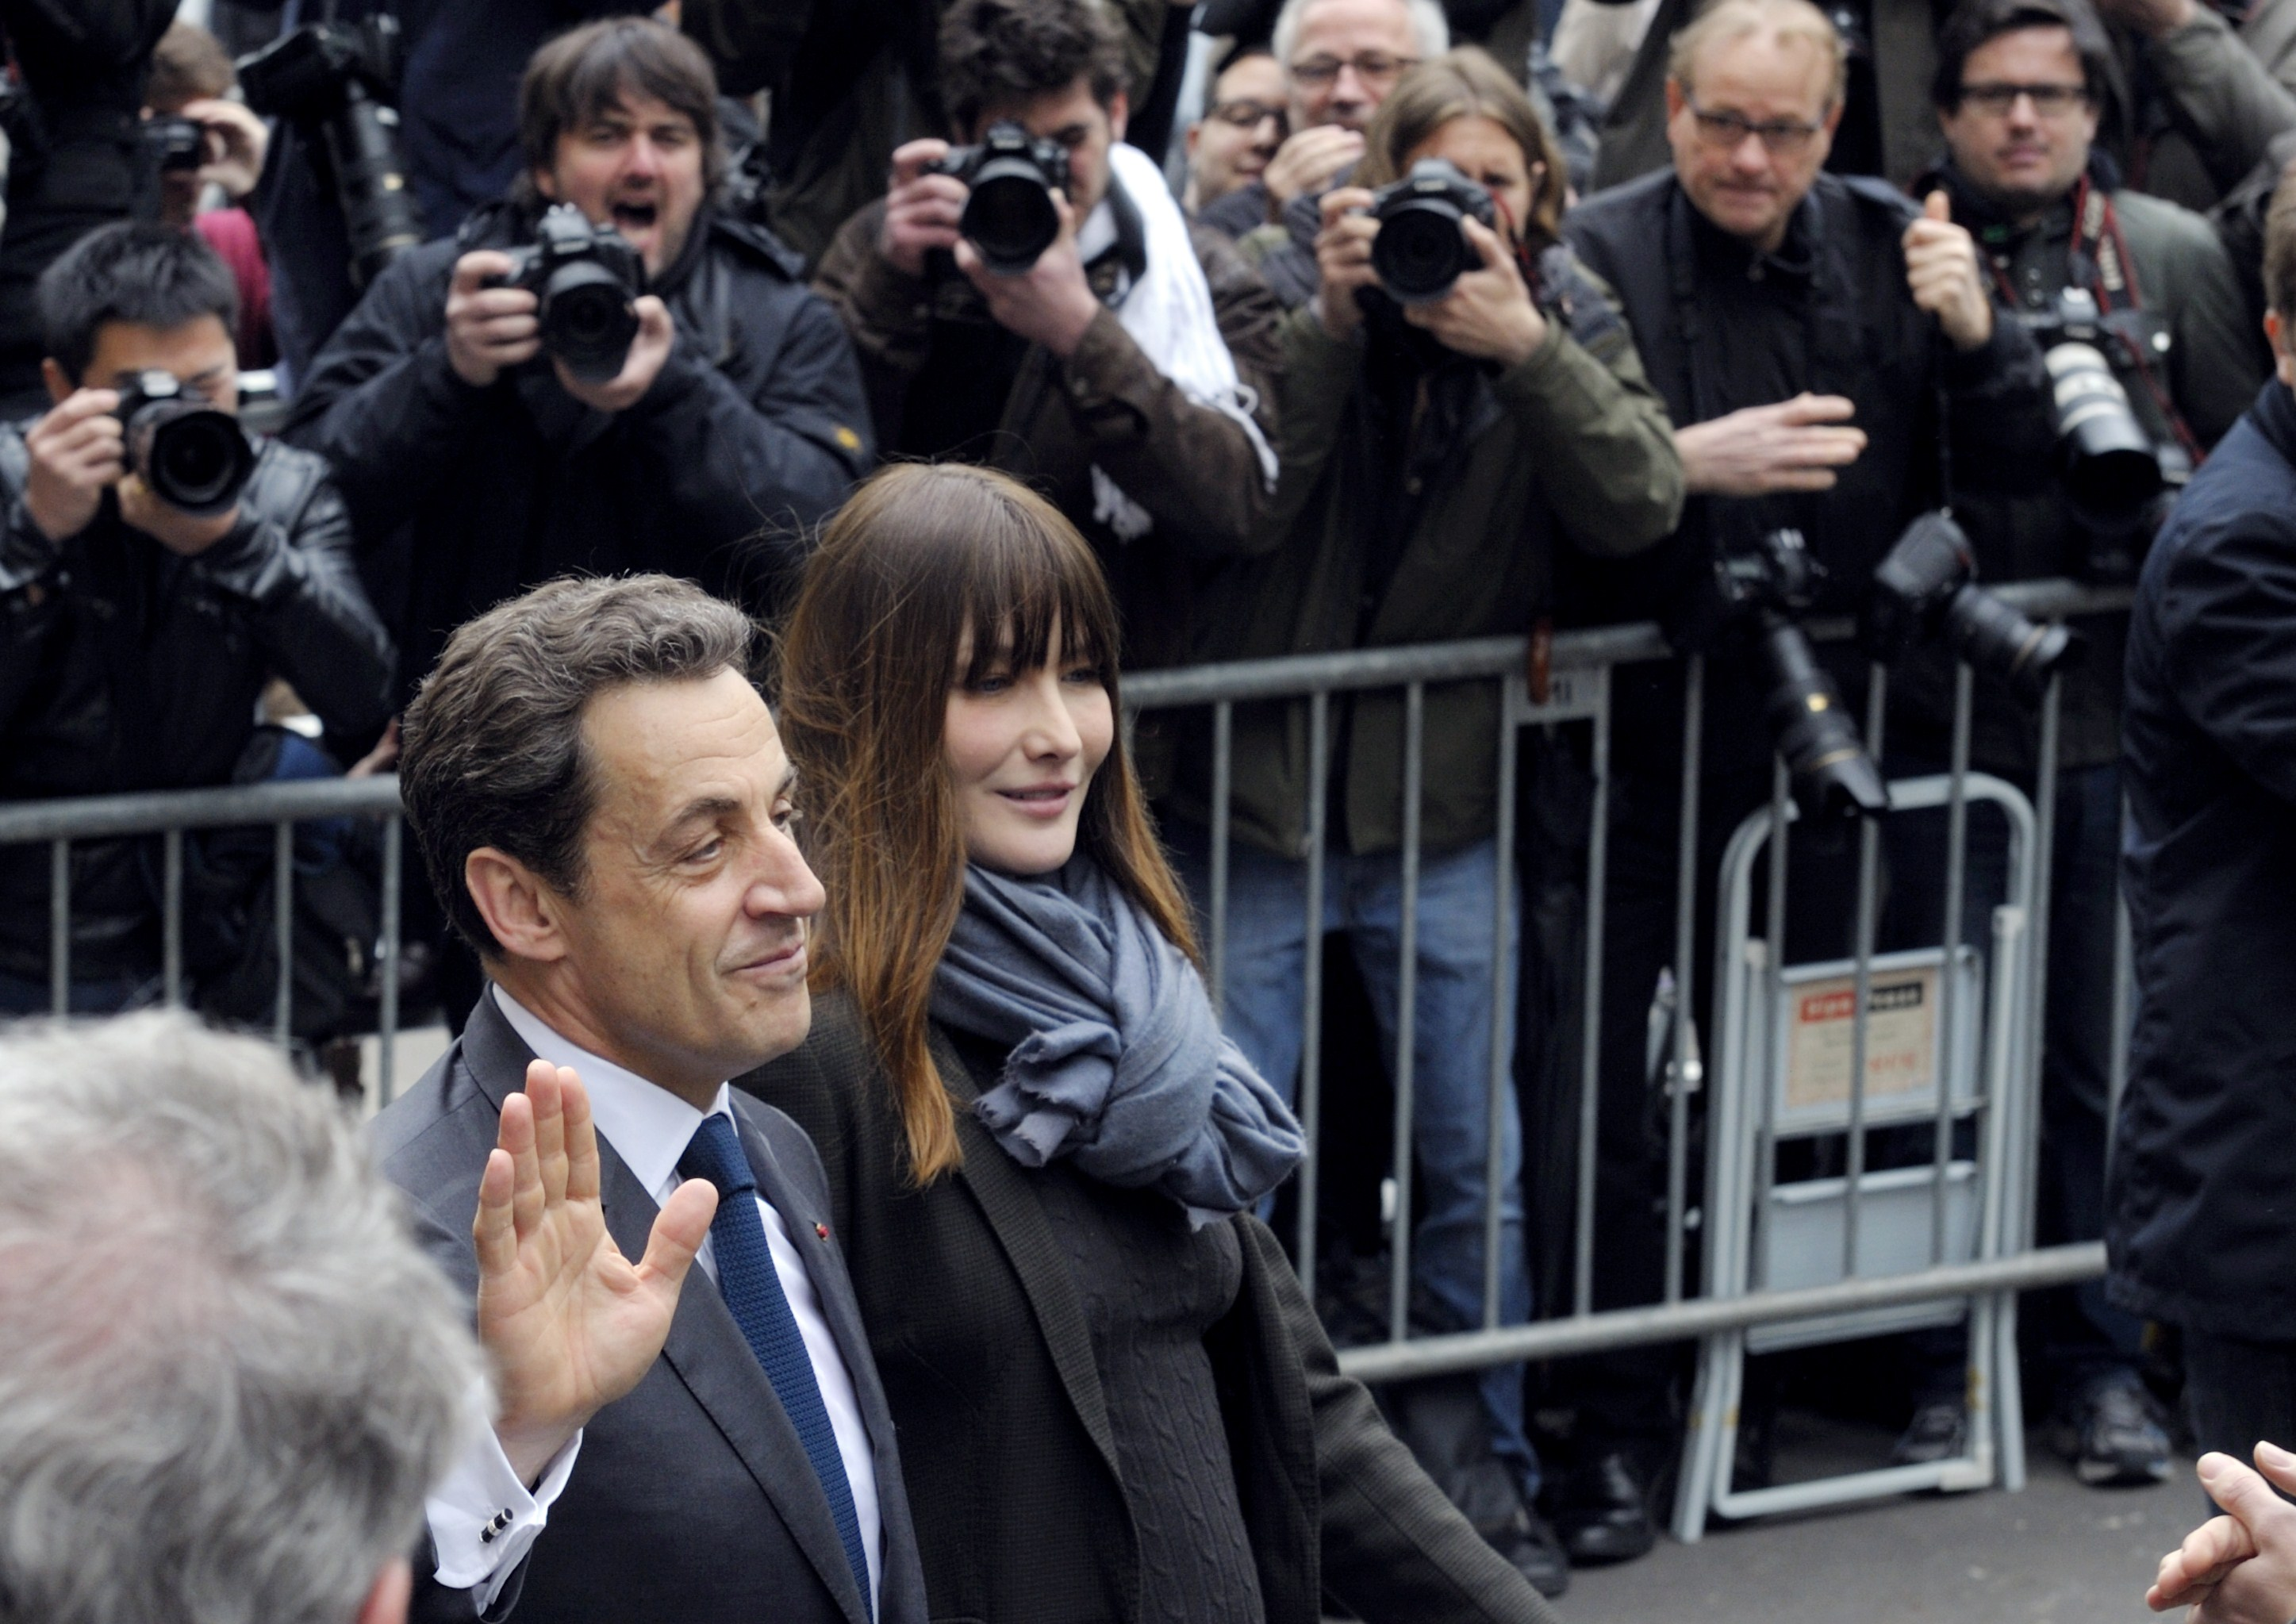 Domiciliul si biroul lui Nicolas Sarkozy, perchezitionate in Franta in dosarul